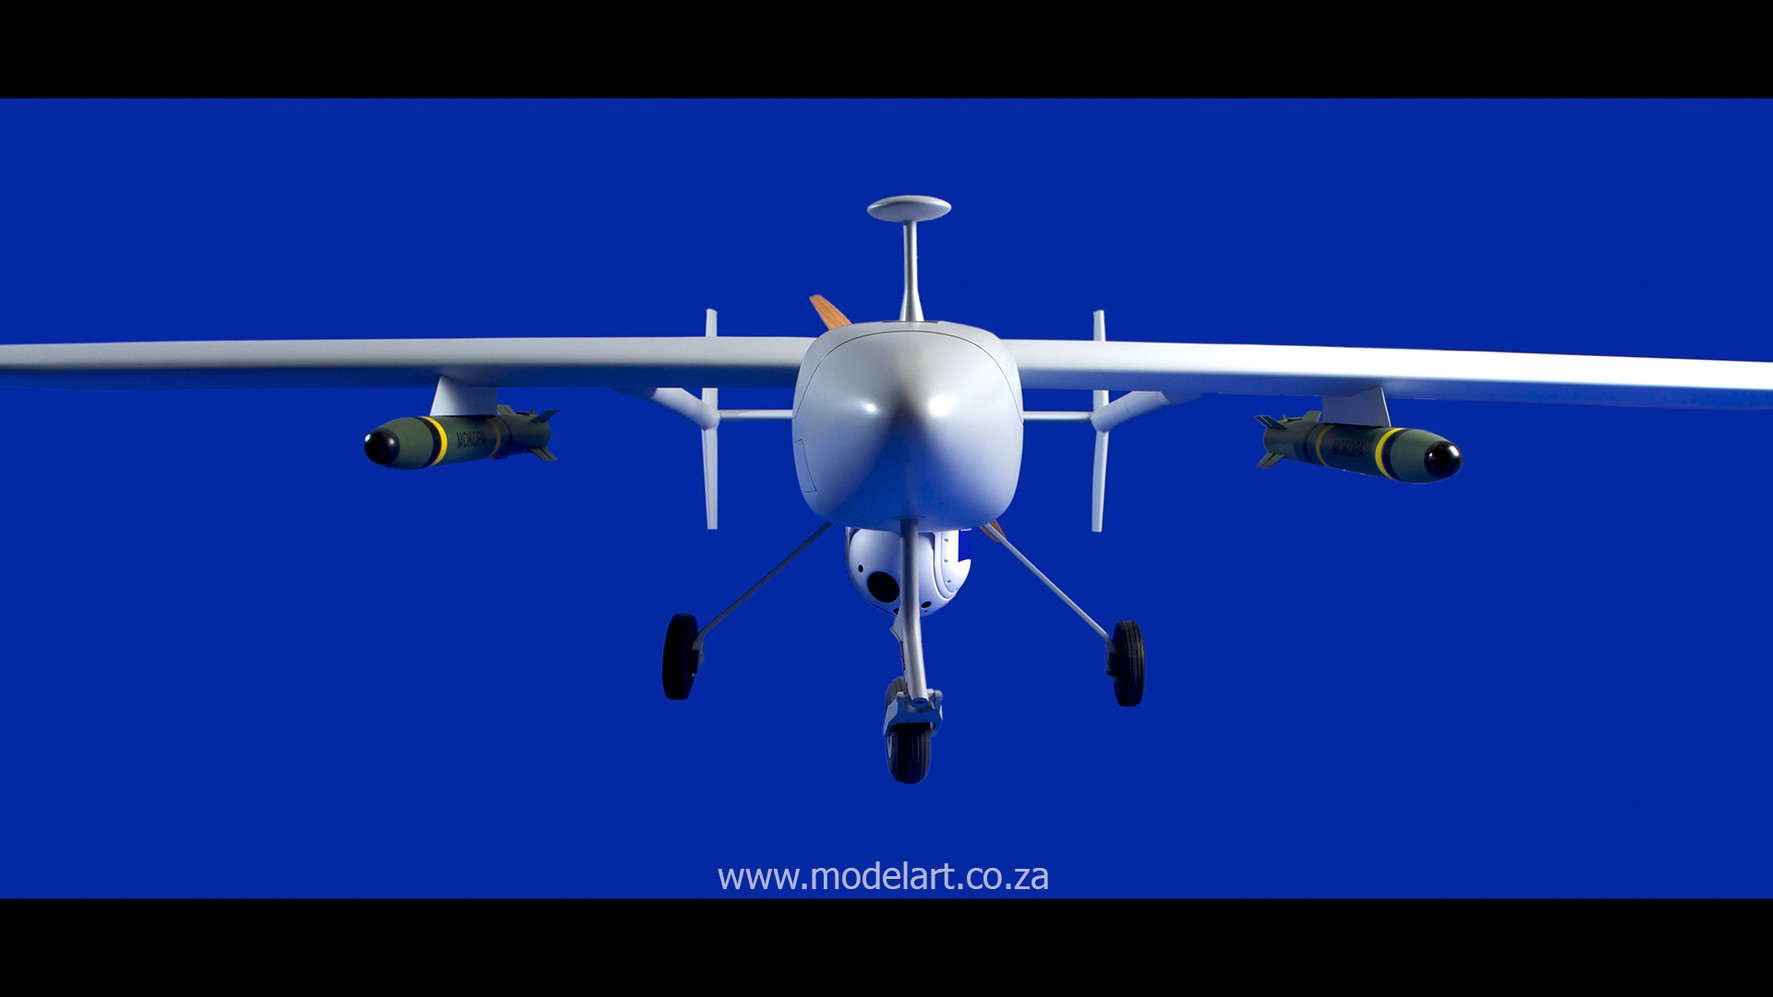 Architectural-Scale-Model-Engineering-Denel Seeker-4